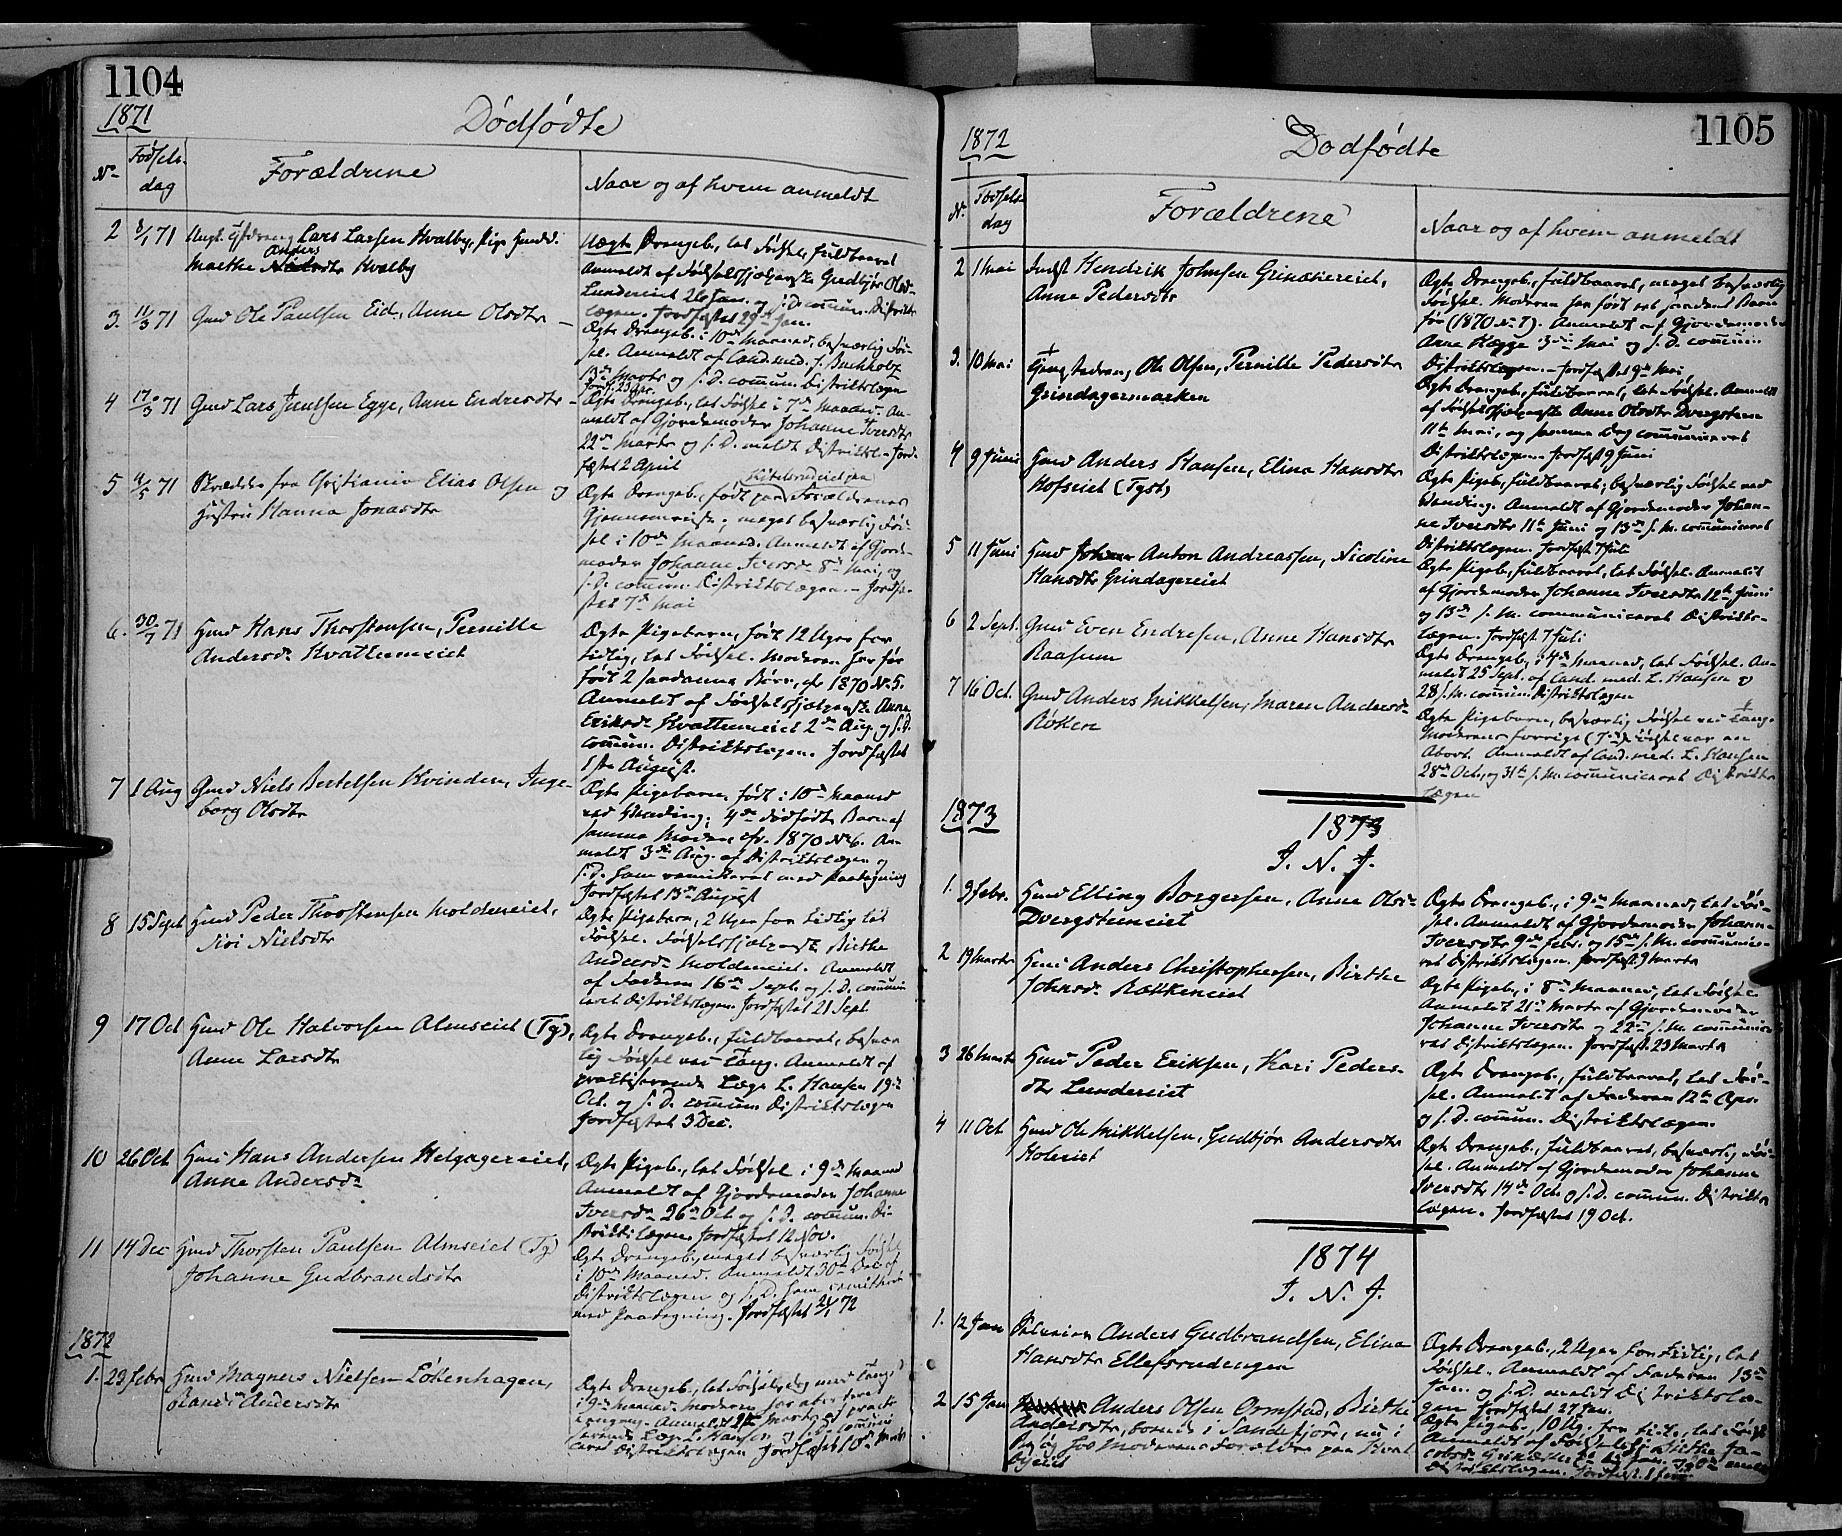 SAH, Gran prestekontor, Ministerialbok nr. 12, 1856-1874, s. 1104-1105